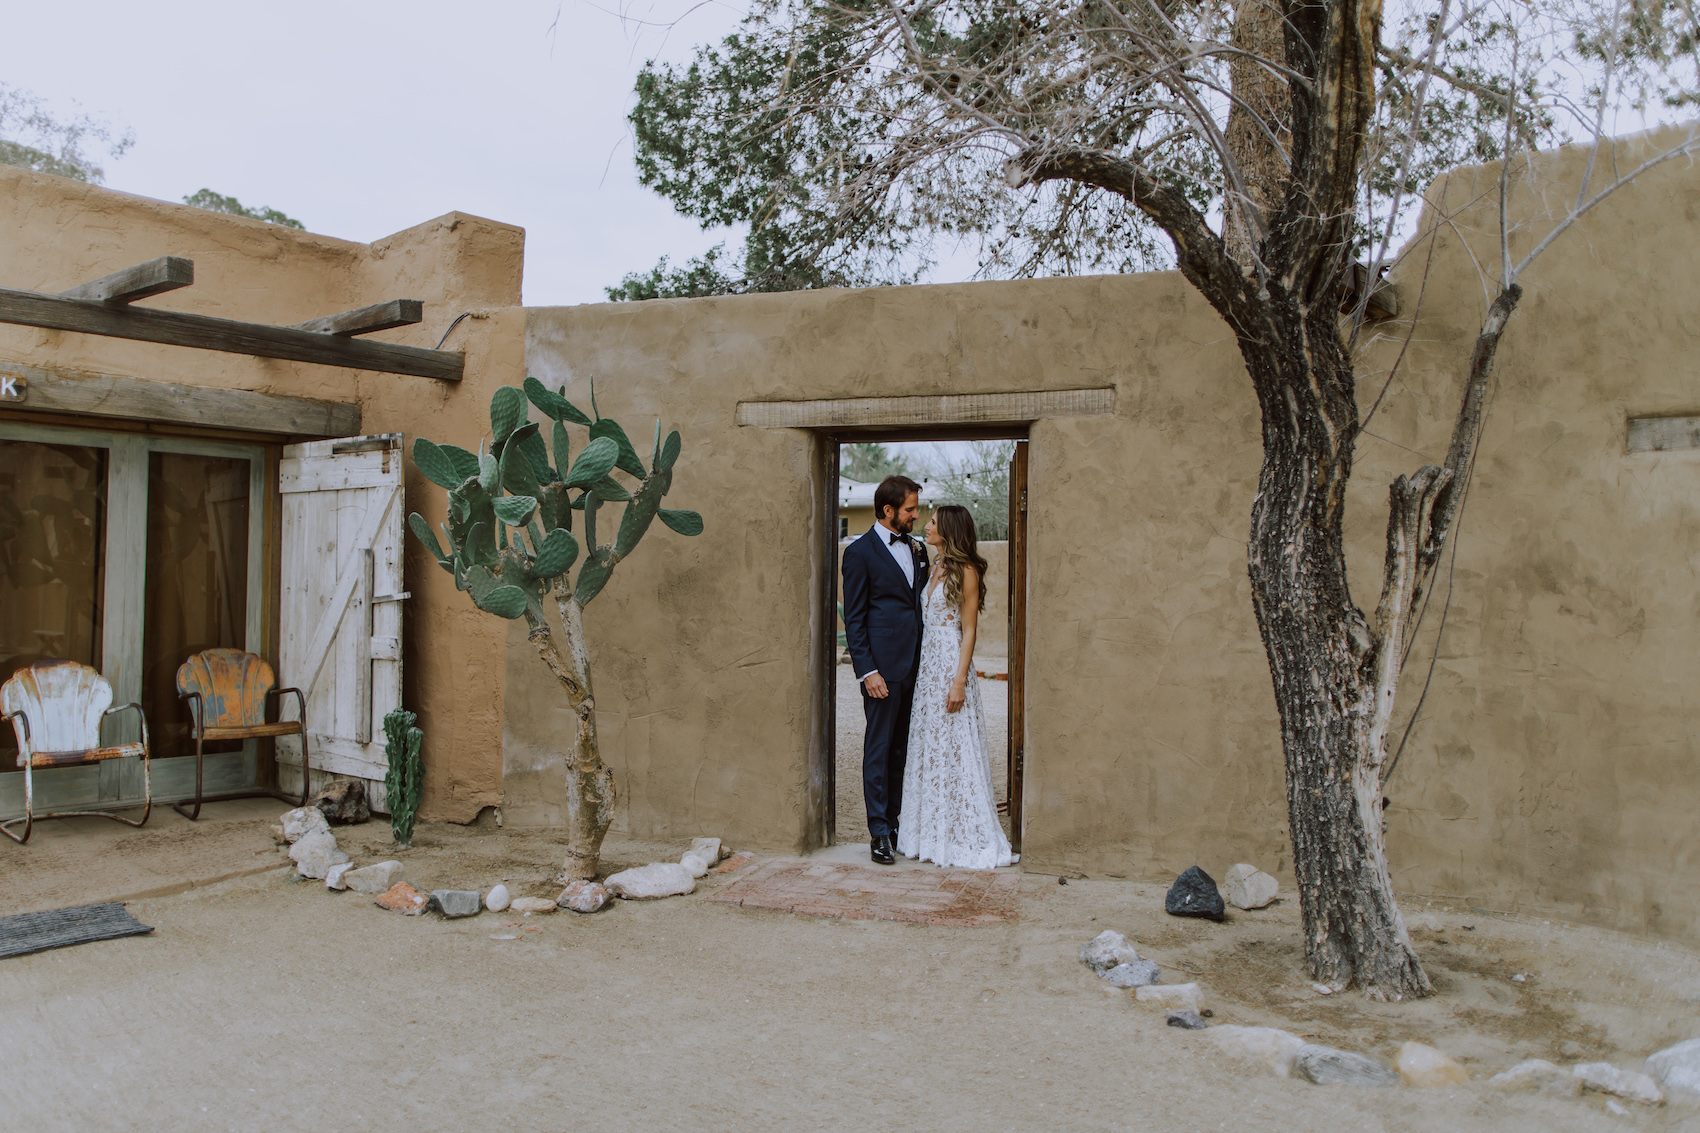 29-Palms-Inn-Joshua-Tree-Jewish-Wedding-H+M-21.jpg